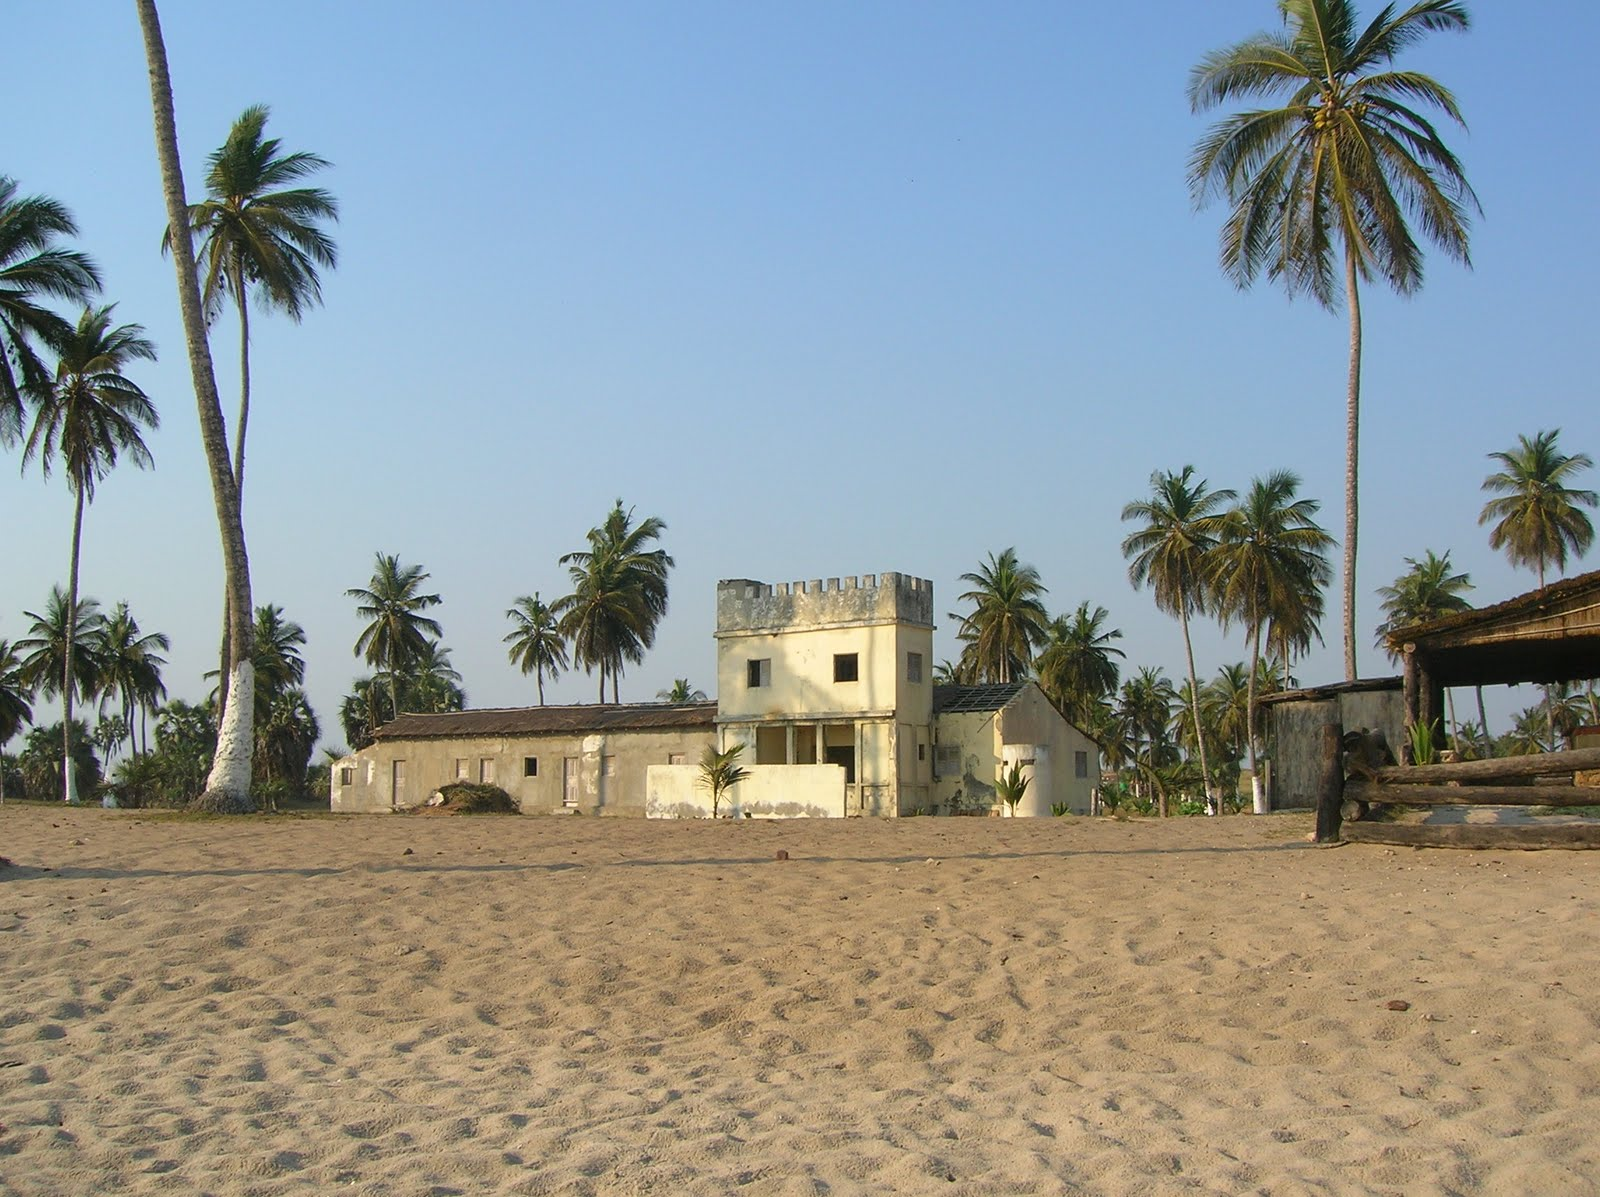 Fundo do turismo angolano vai receber 10% das receitas de vistos turísticos